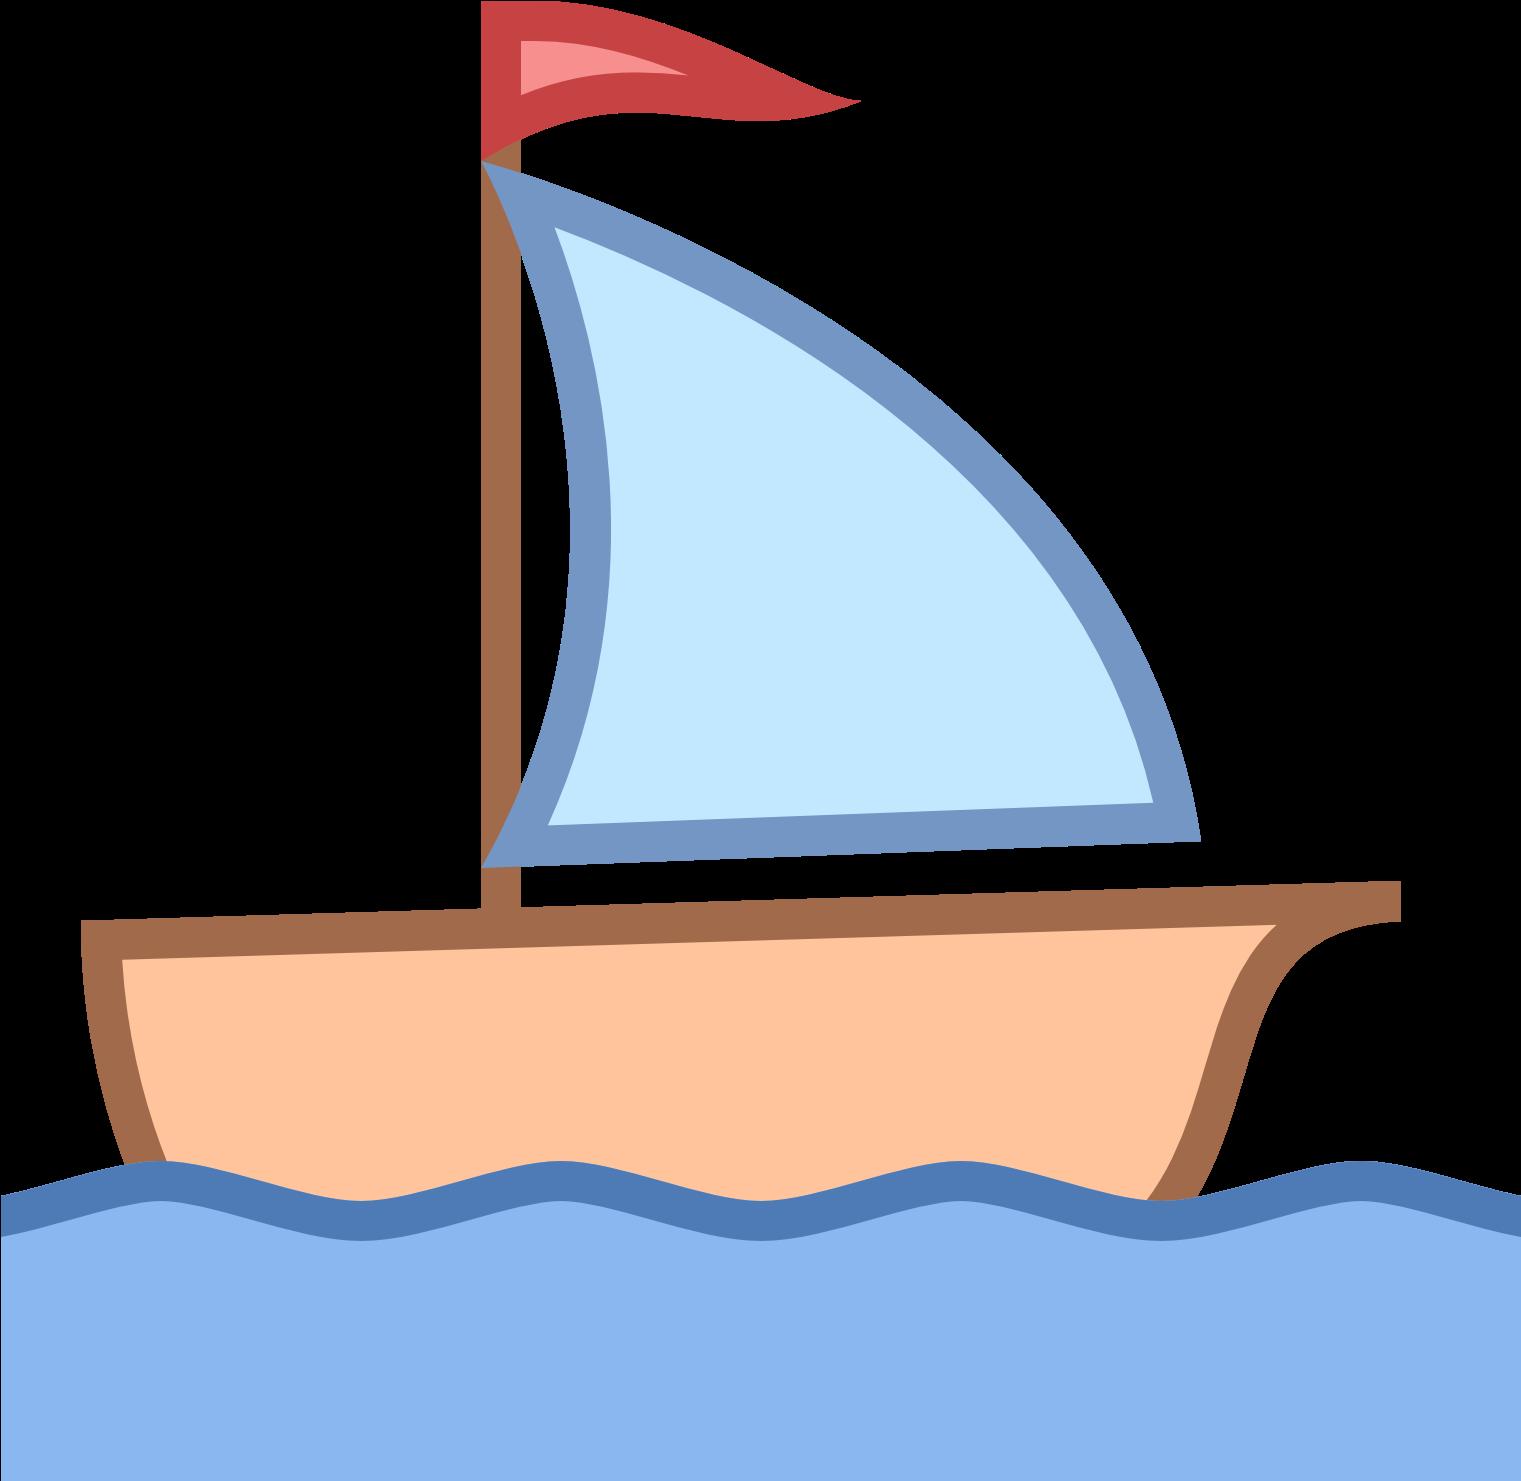 Sailboat Clipart Boating - Sail Boat Clip Art (1600x1600), Png Download